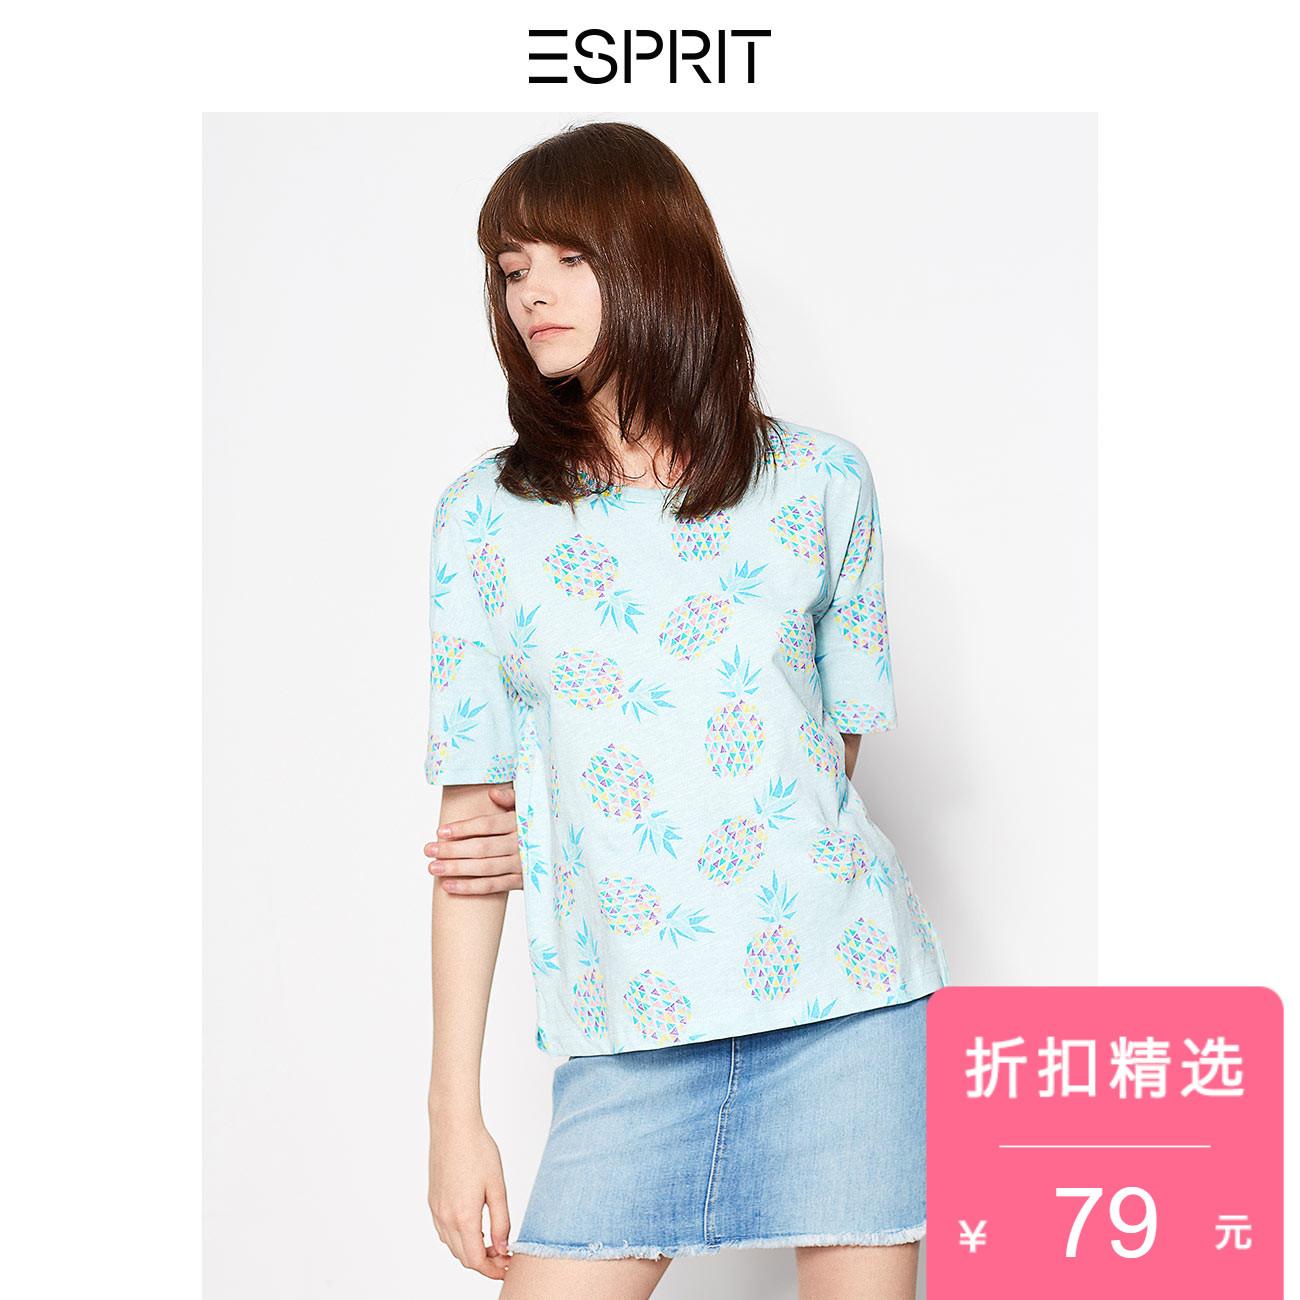 ESPRIT女装夏装纯棉时尚水果印花宽松休闲短袖上衣T恤-058EE1K059